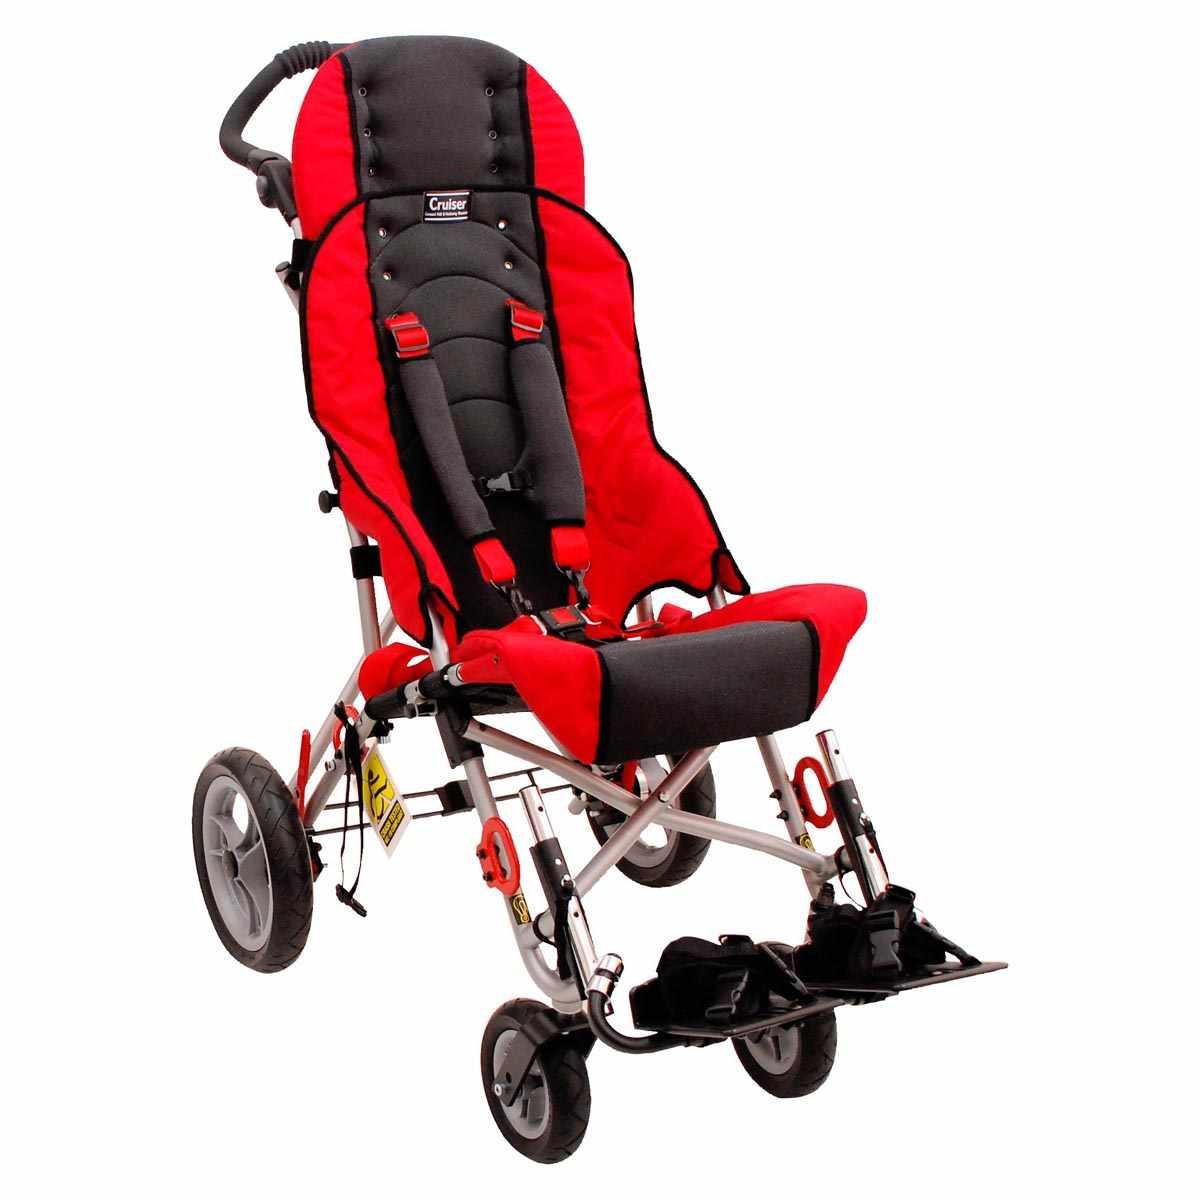 Convaid cruiser stroller